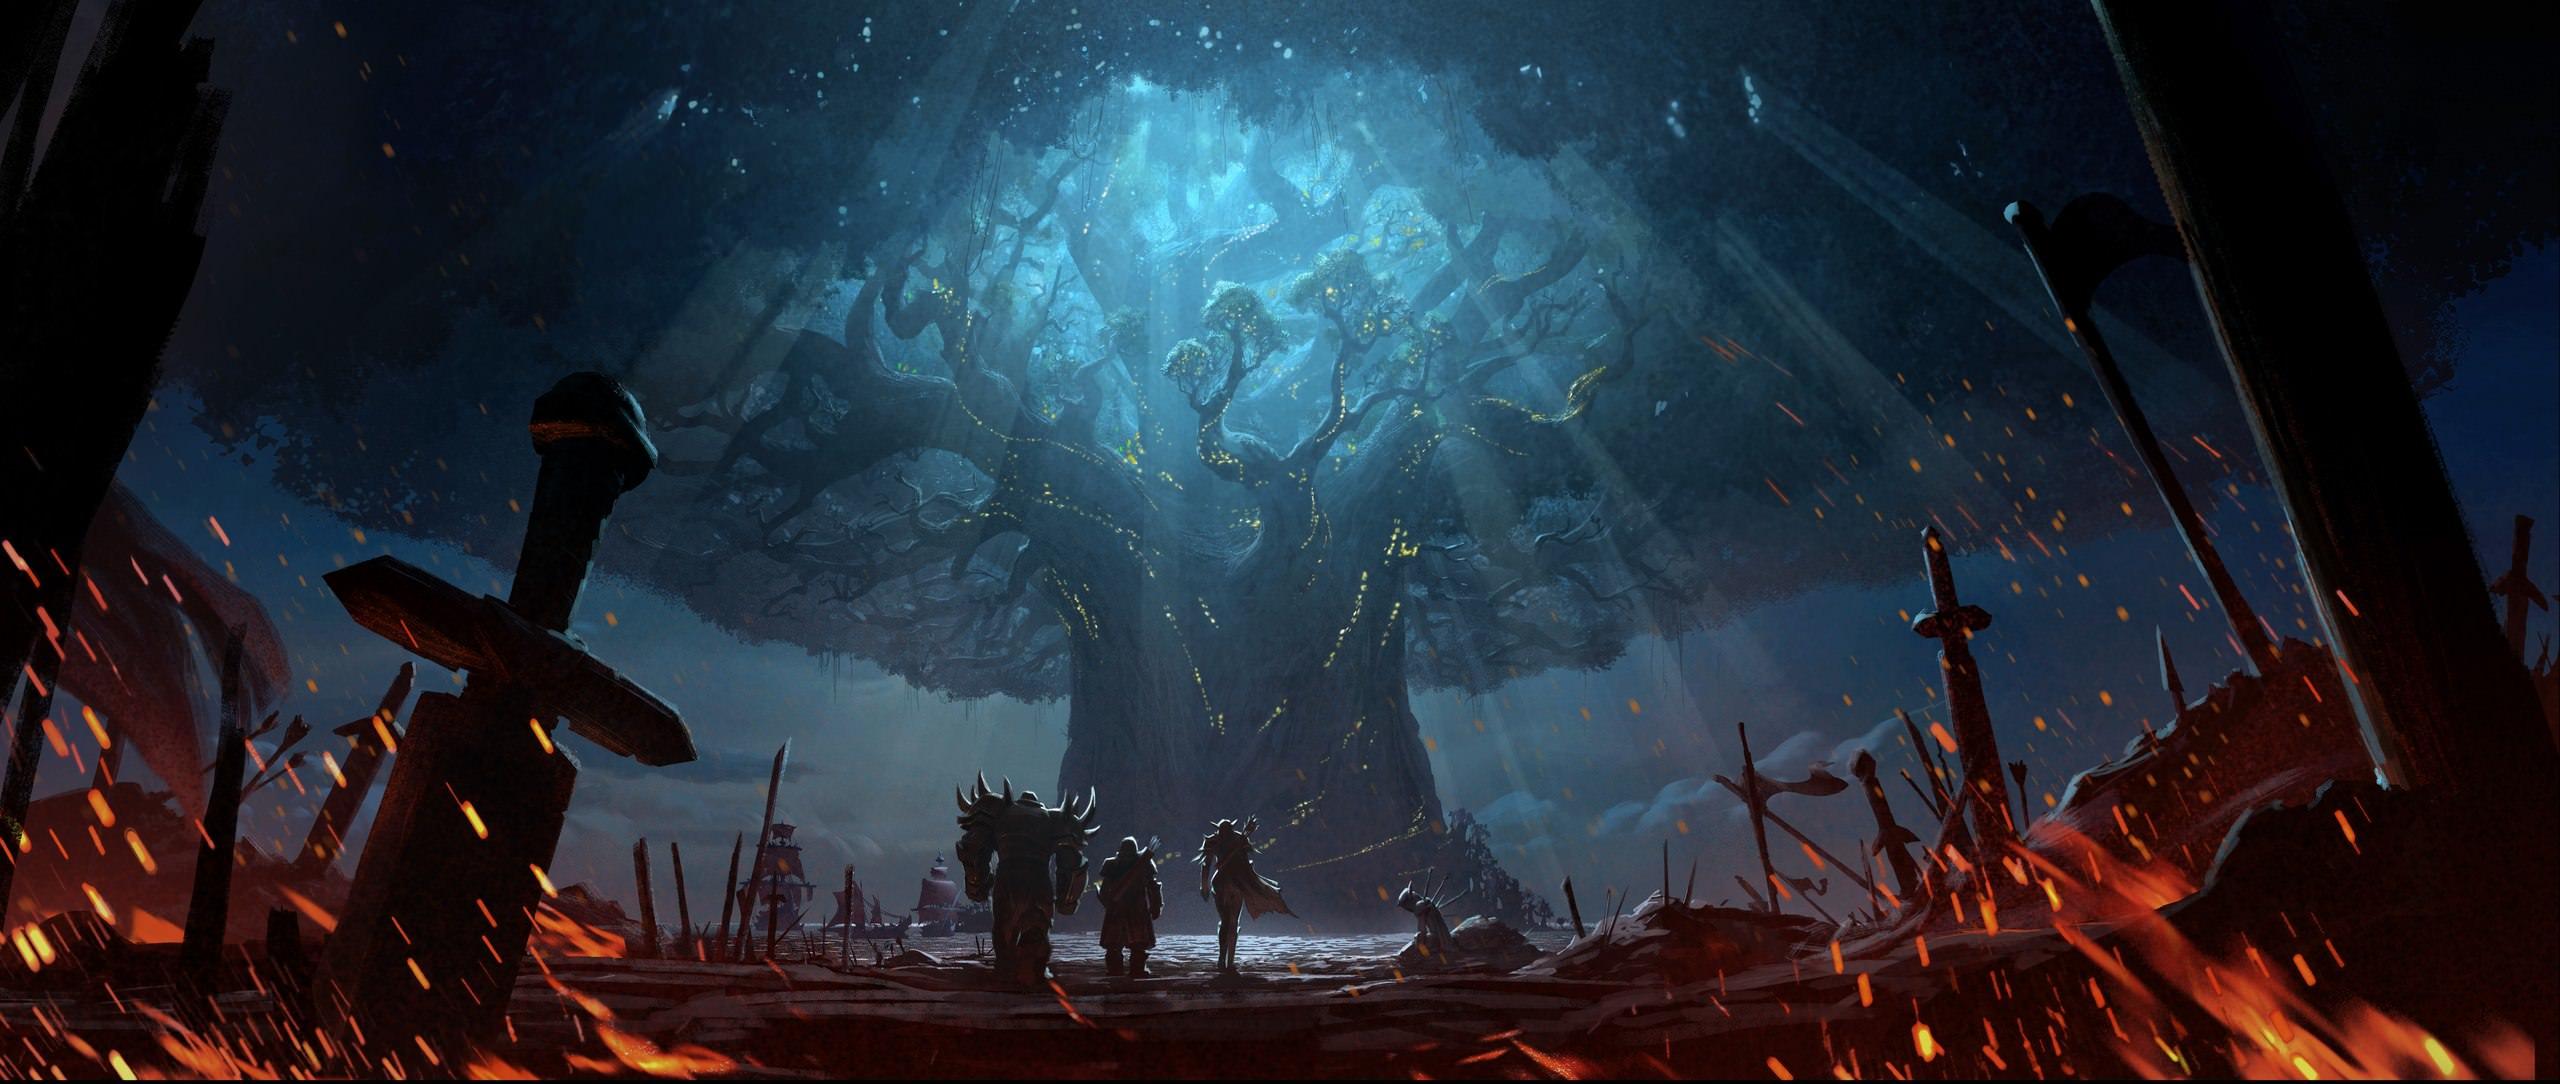 W2fYeAW.jpg - World of Warcraft